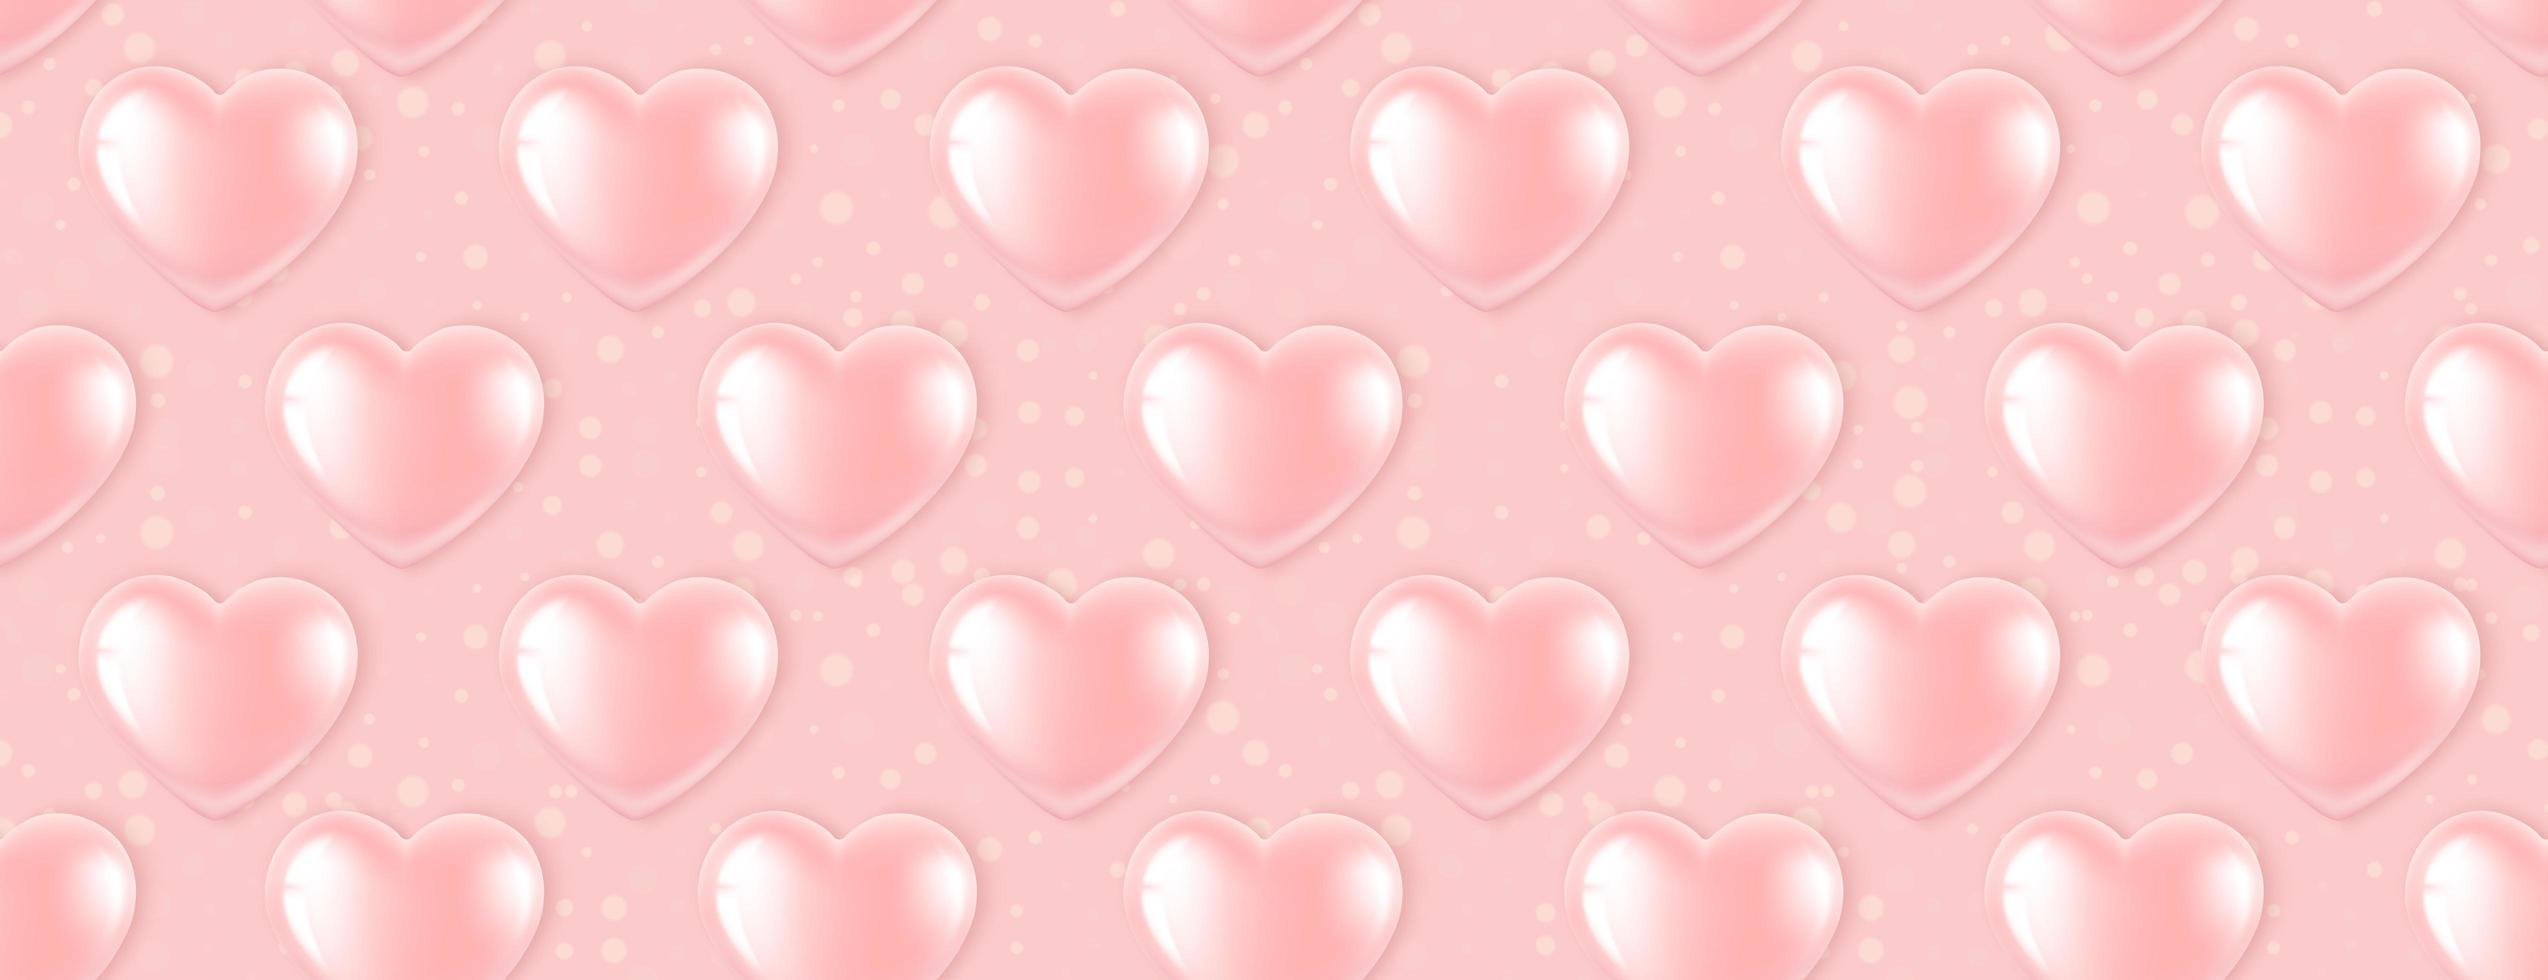 Seamless mönster med rosa hjärtballonger vektor